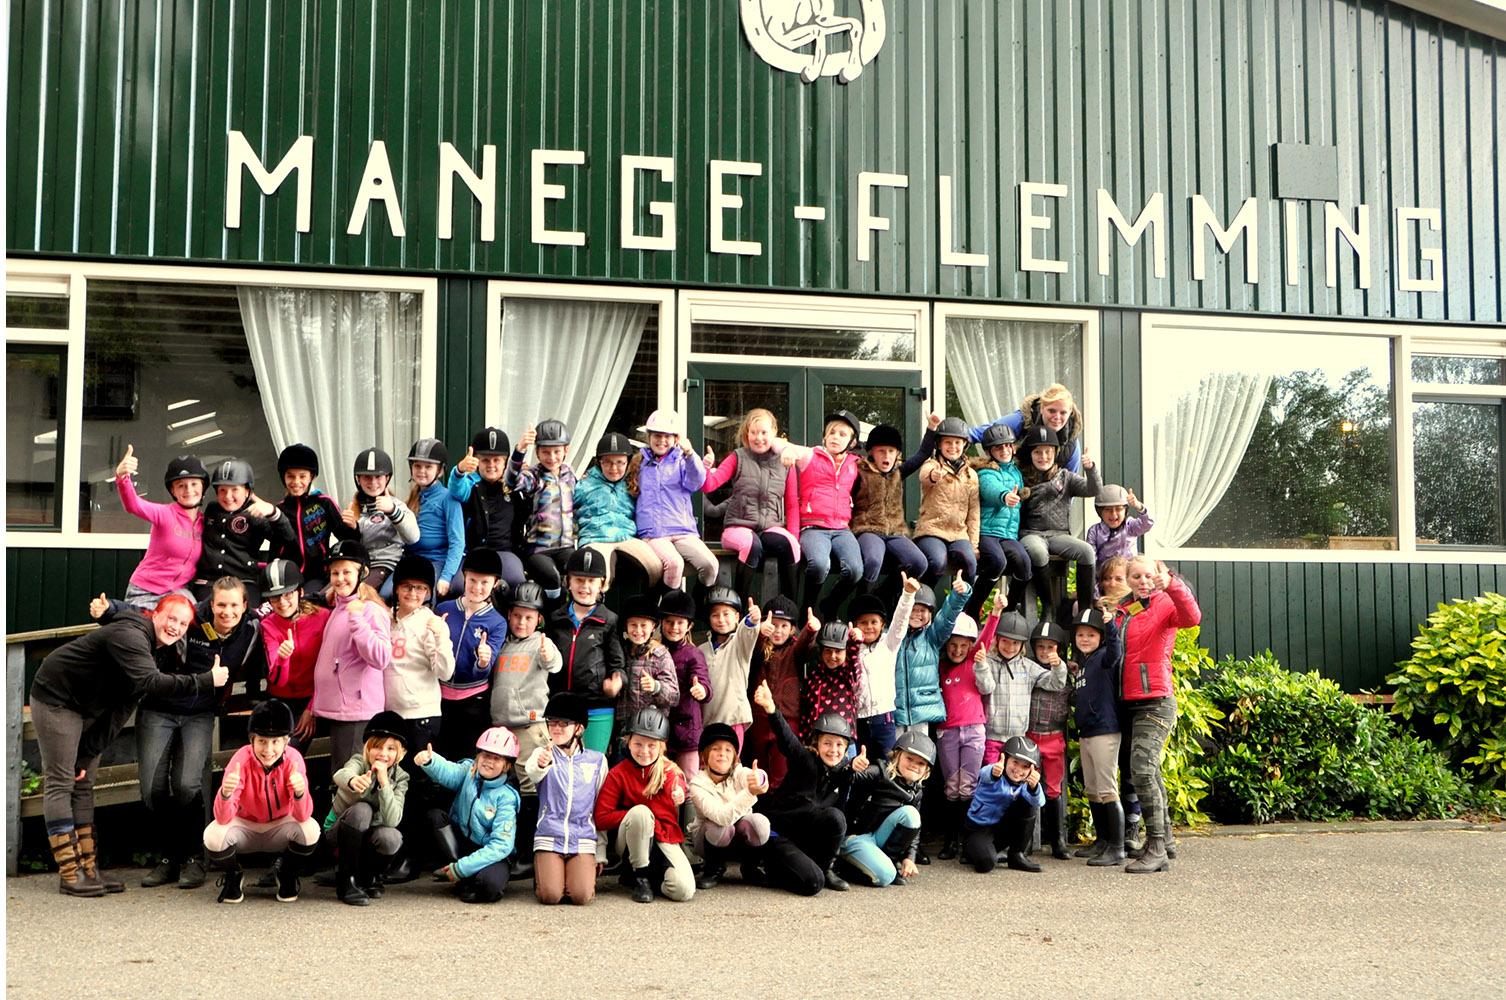 manege-flemming-paarden-westmaas